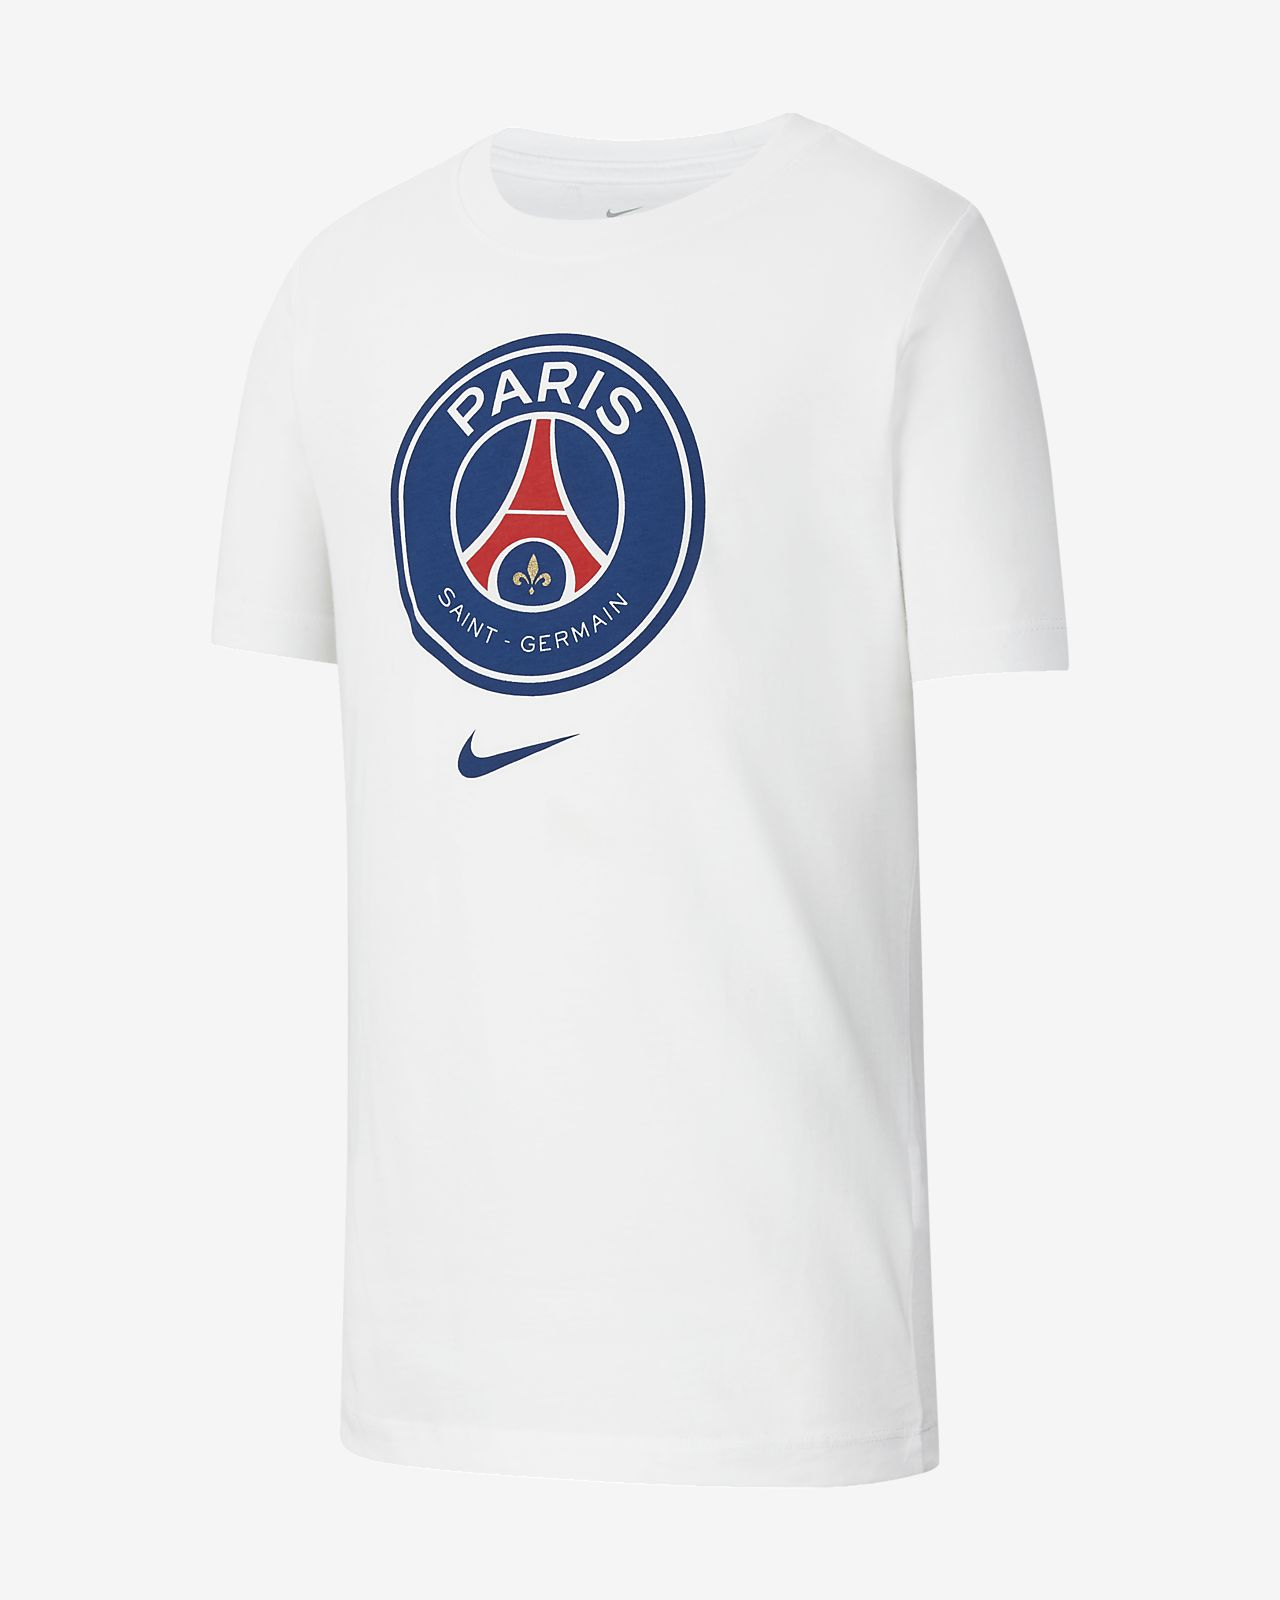 Paris Saint-Germain Older Kids' T-Shirt